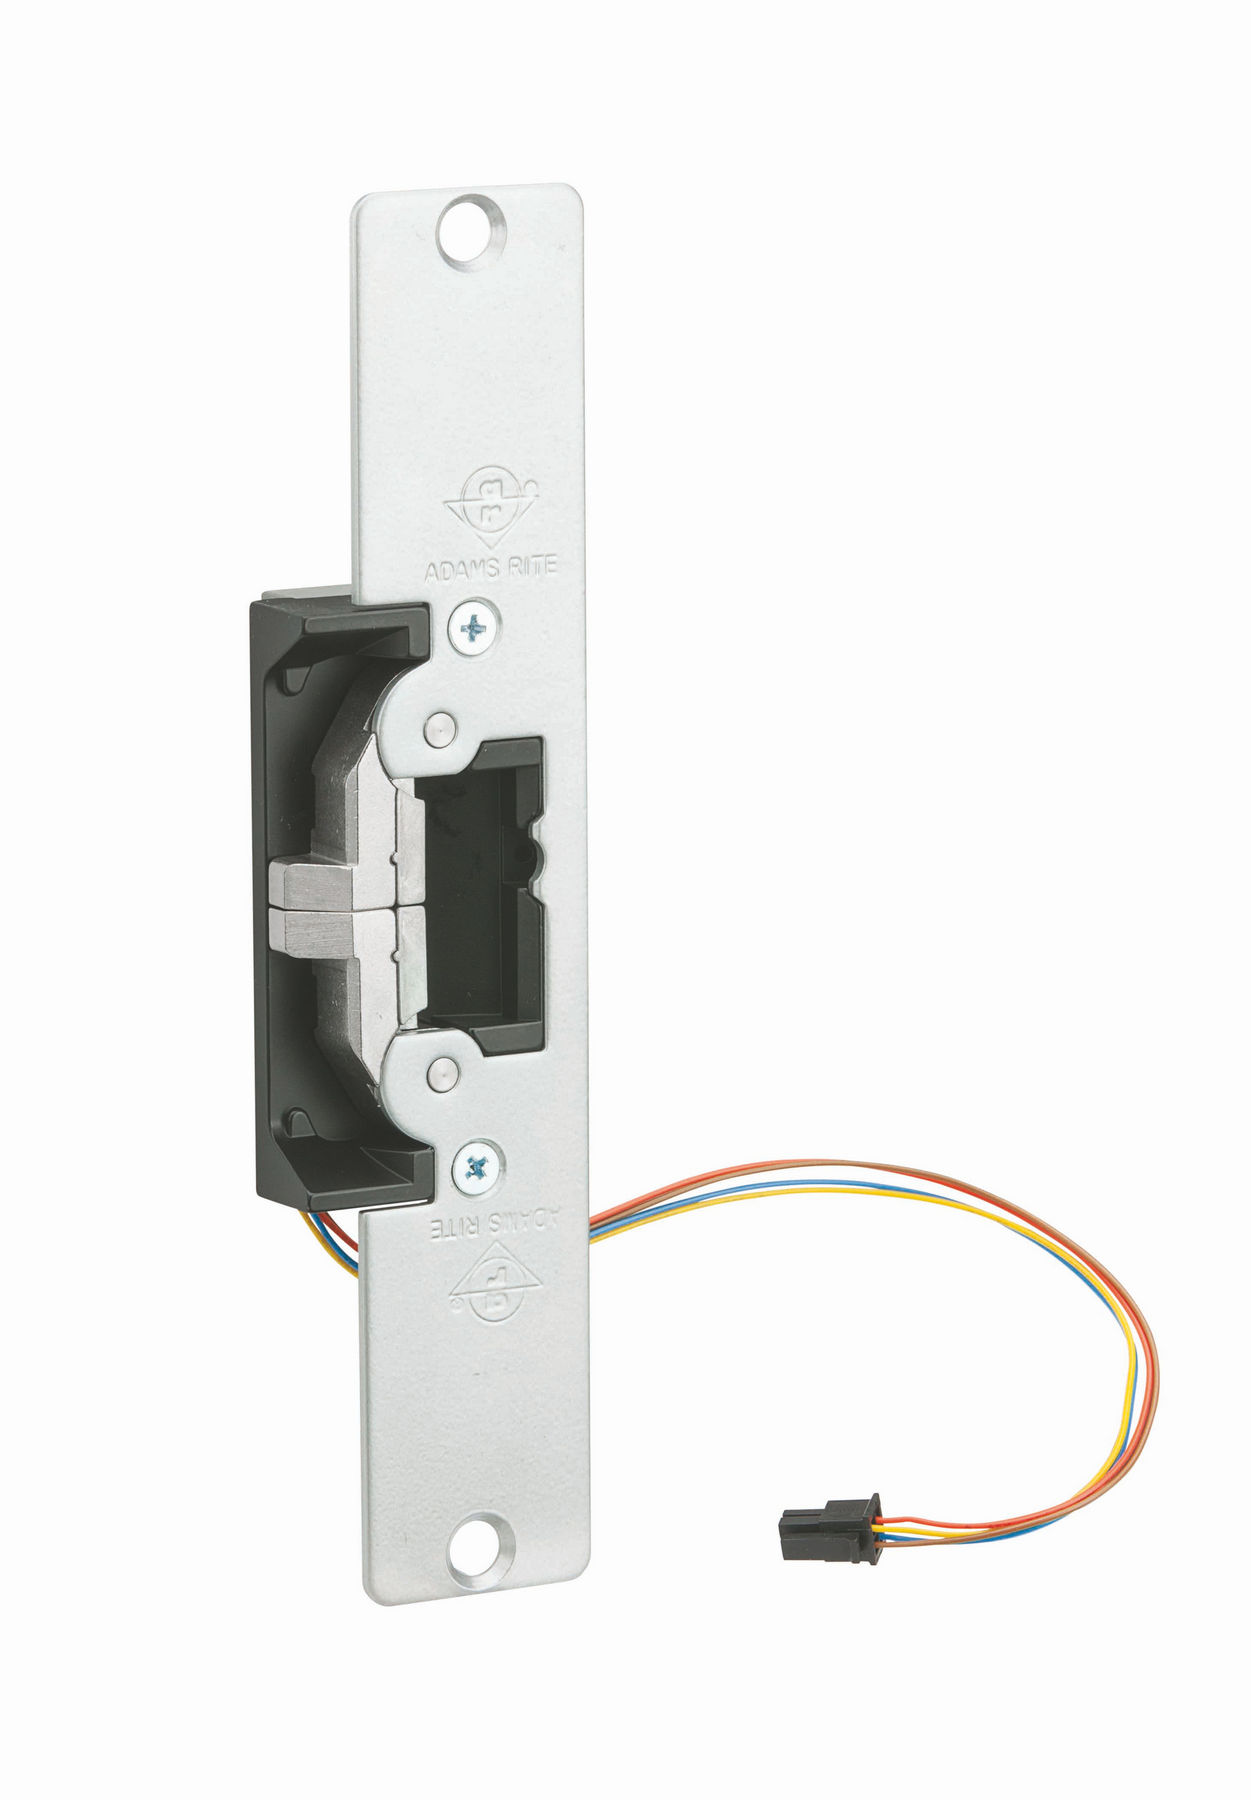 Adams Rite 7410 630 Electric Strike 7400 Series Satin